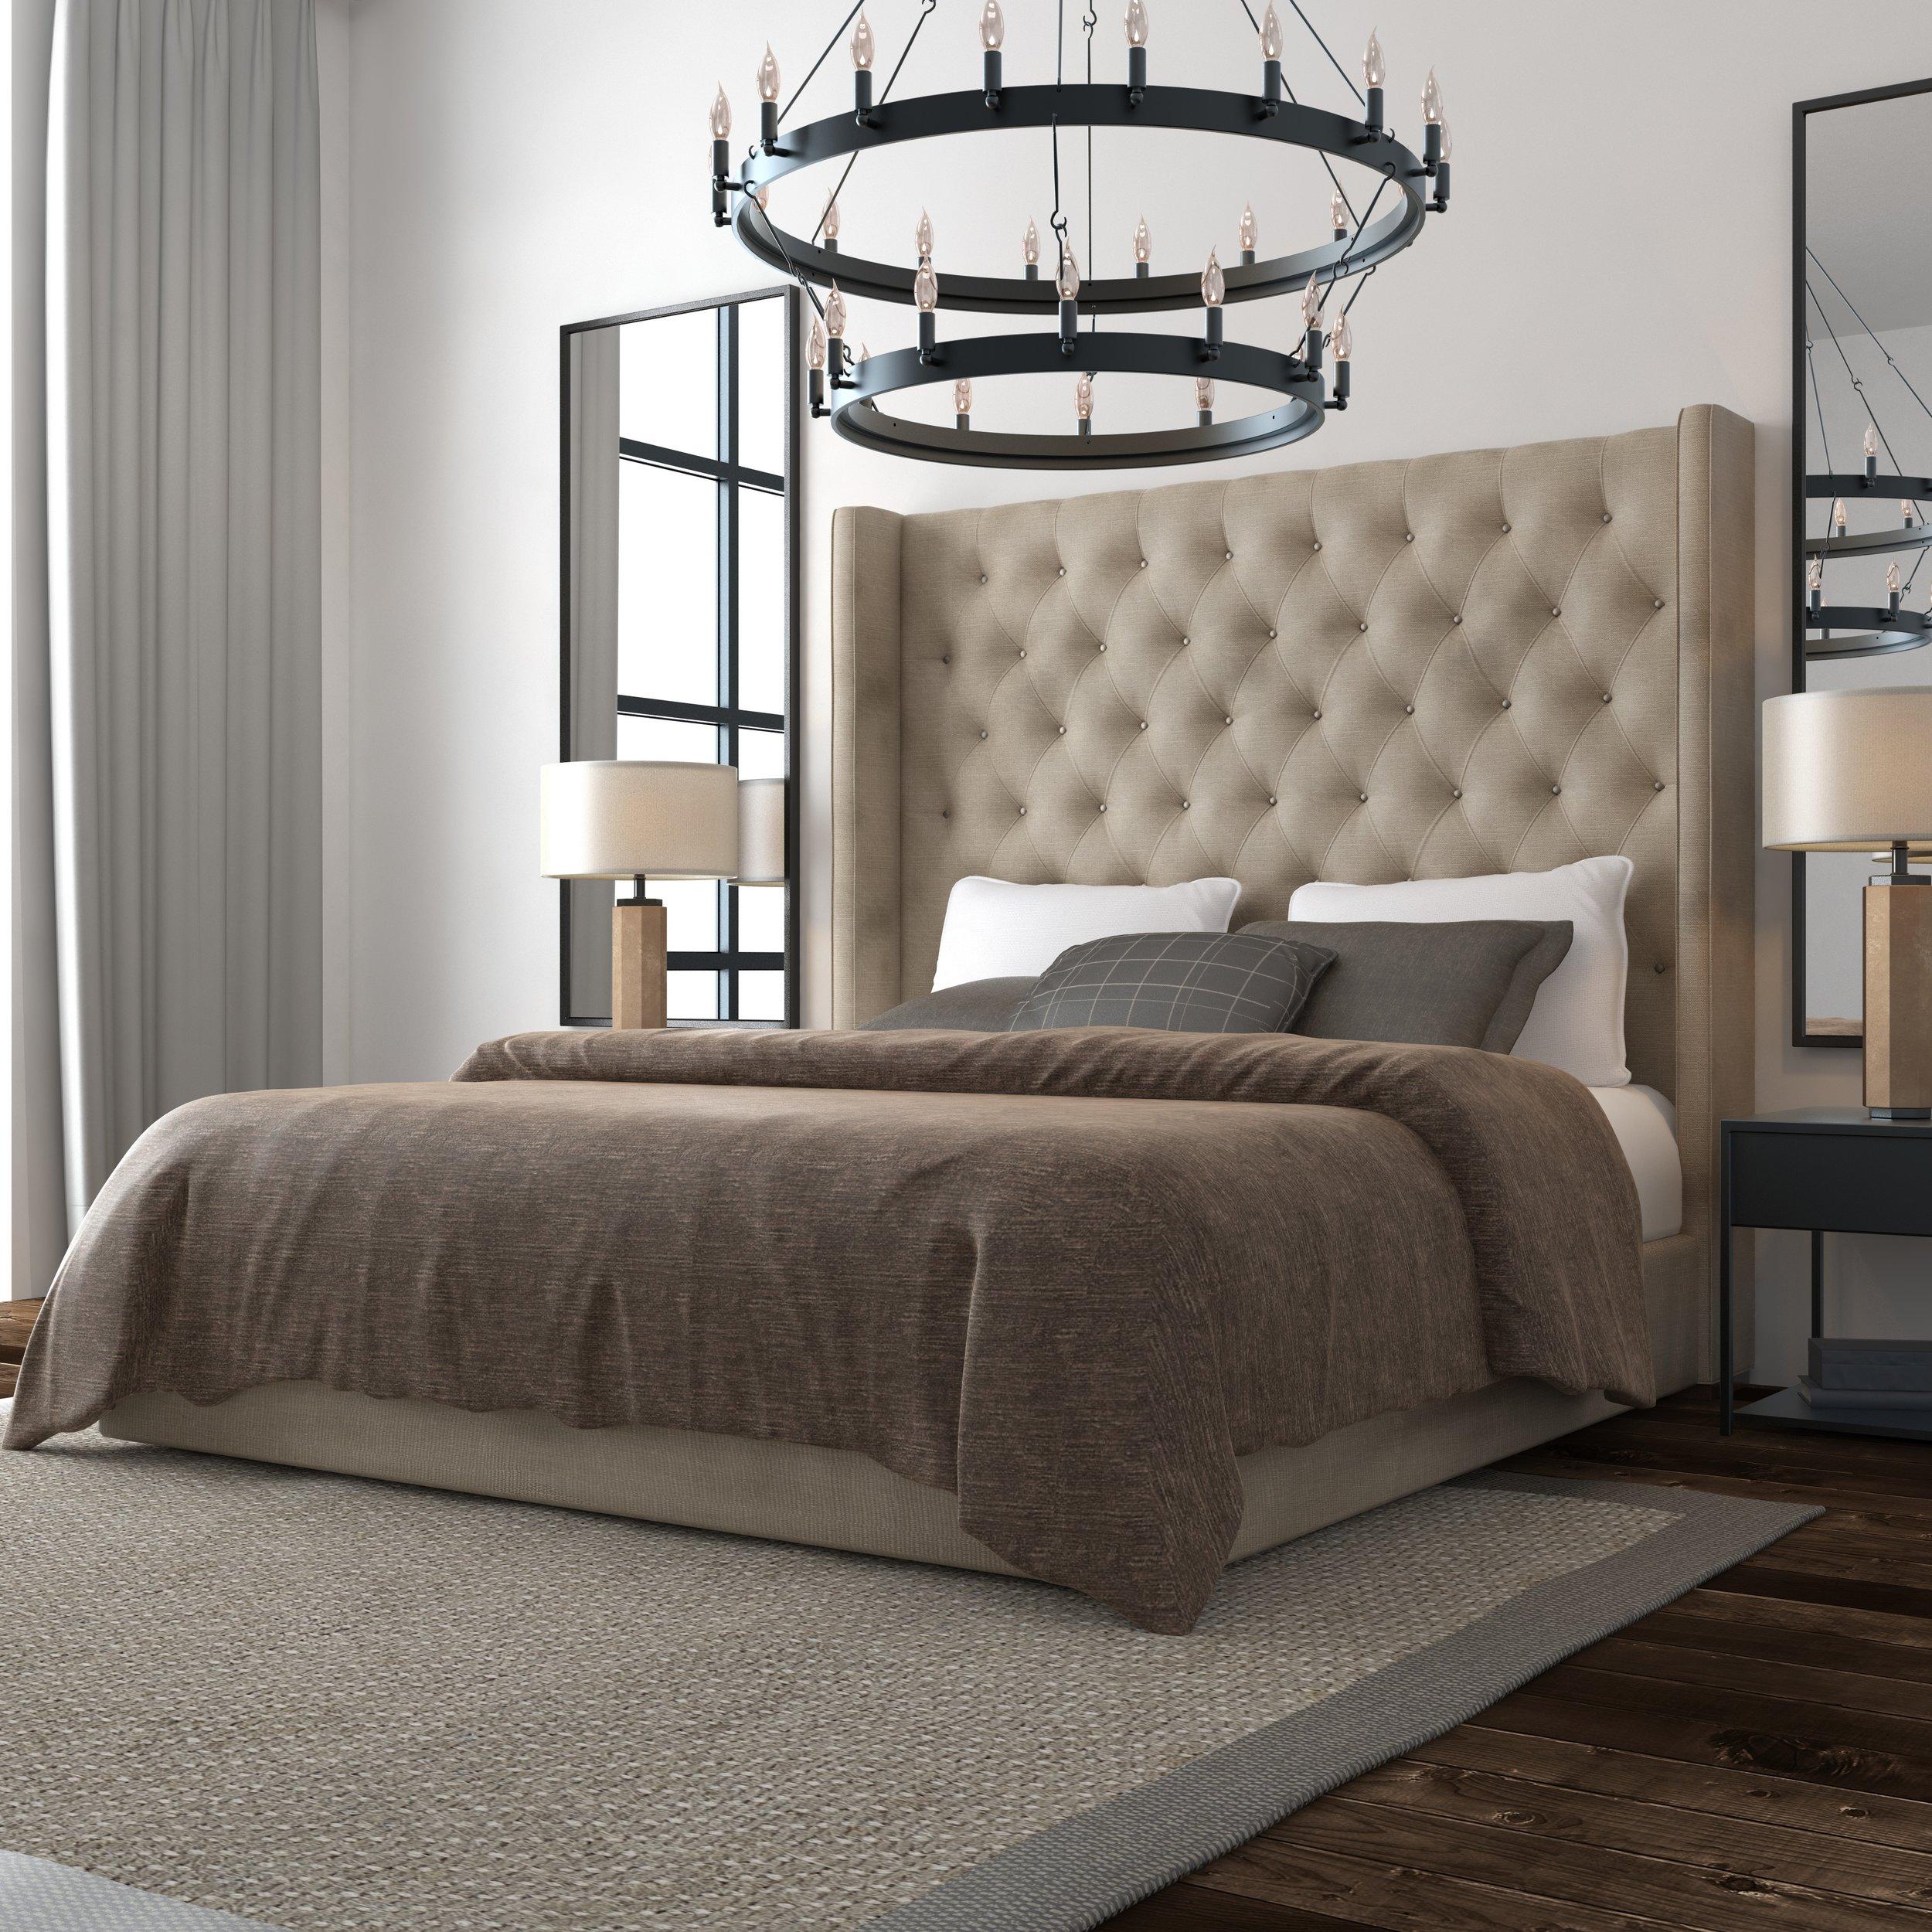 Master-Bedroom-AS-82768897.jpeg